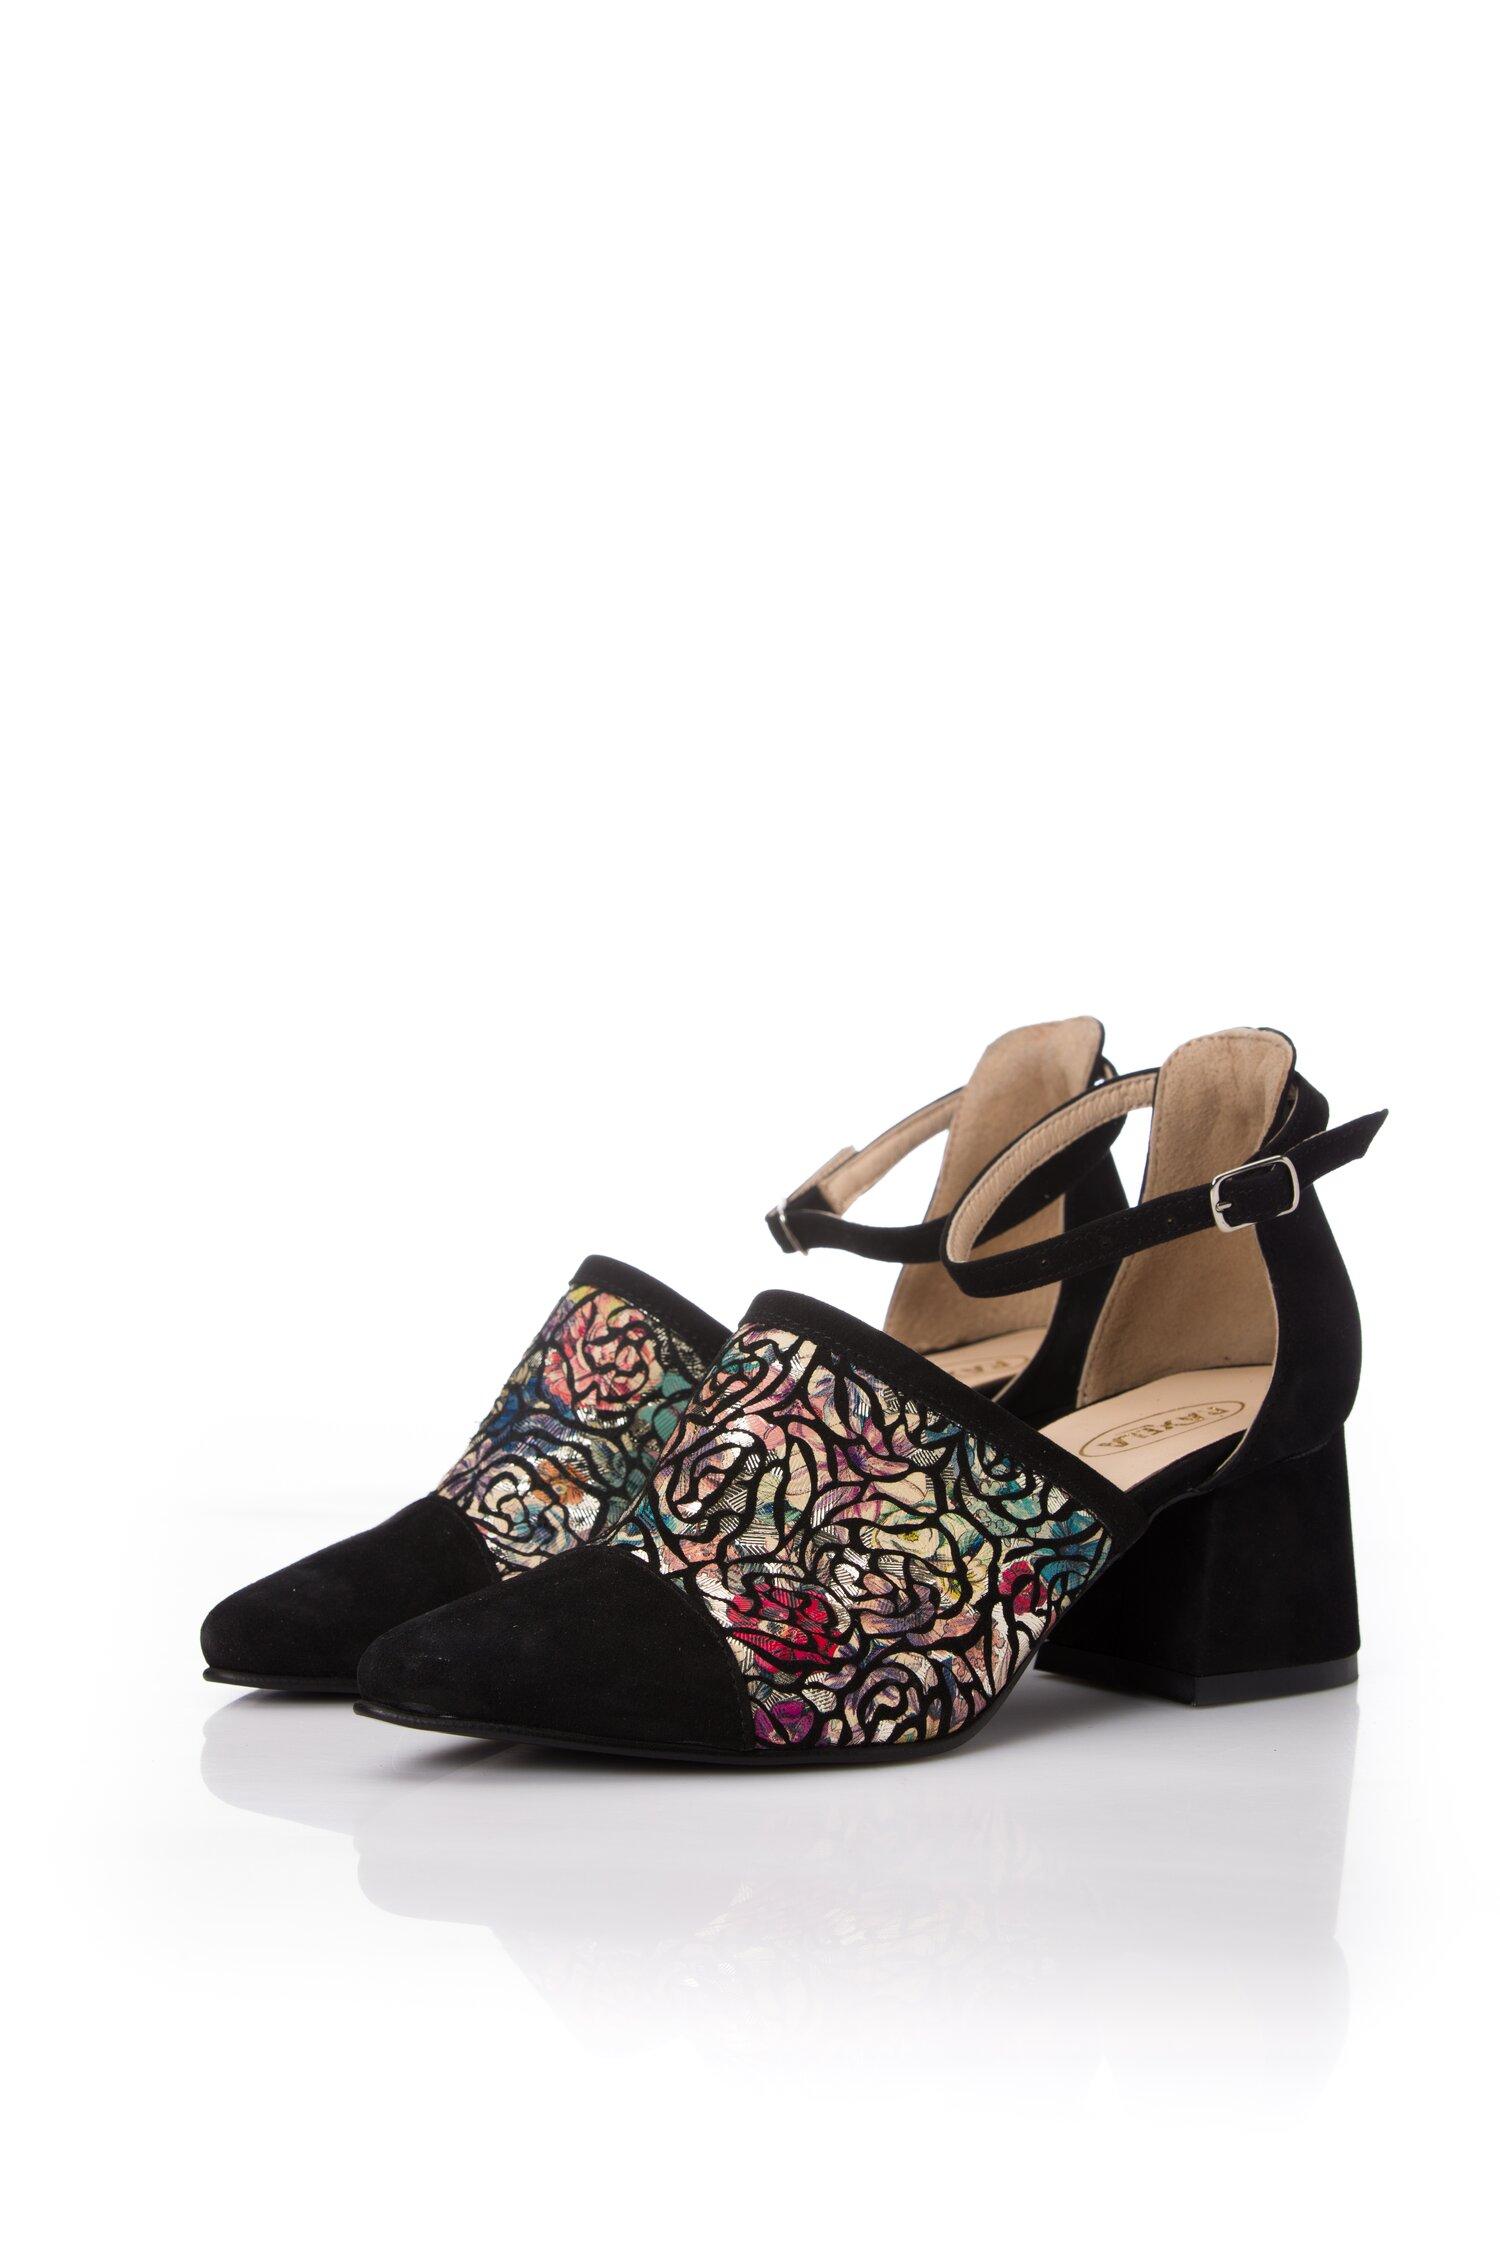 Pantofi negri cu bareta la glezna si imprimeu floral